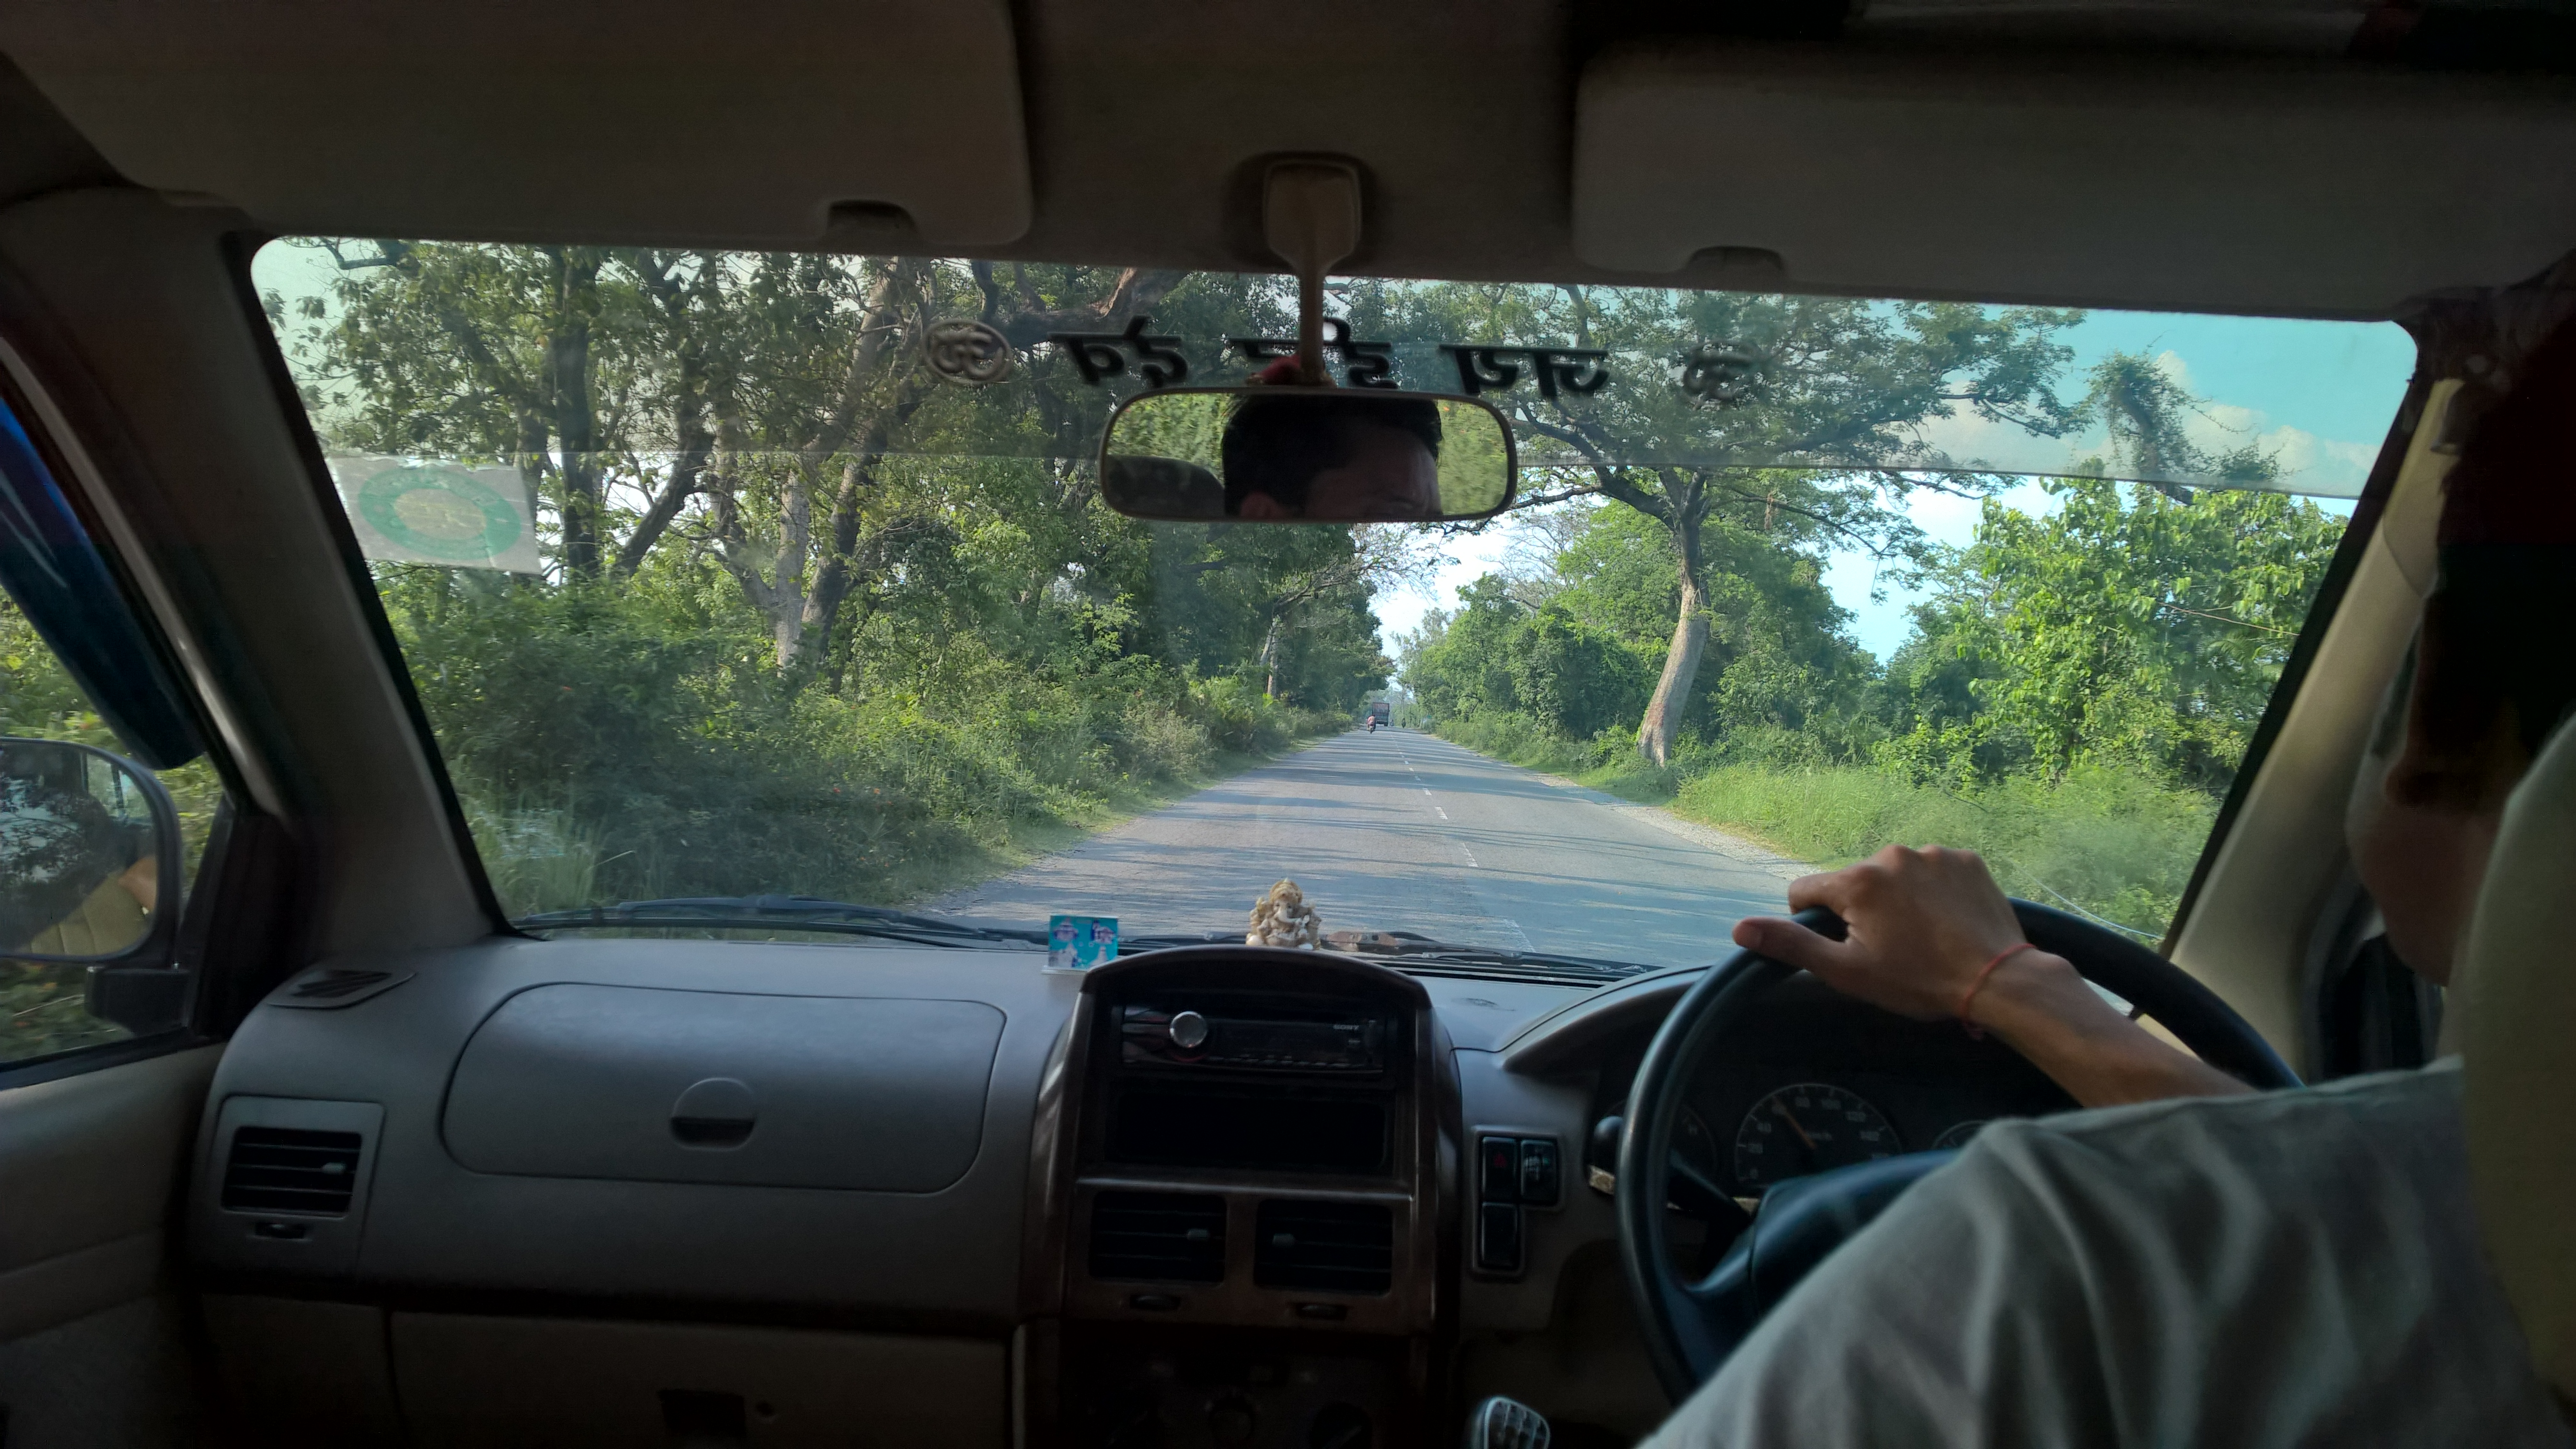 Drive from Pantnagar to Joelikote, Uttarakhand